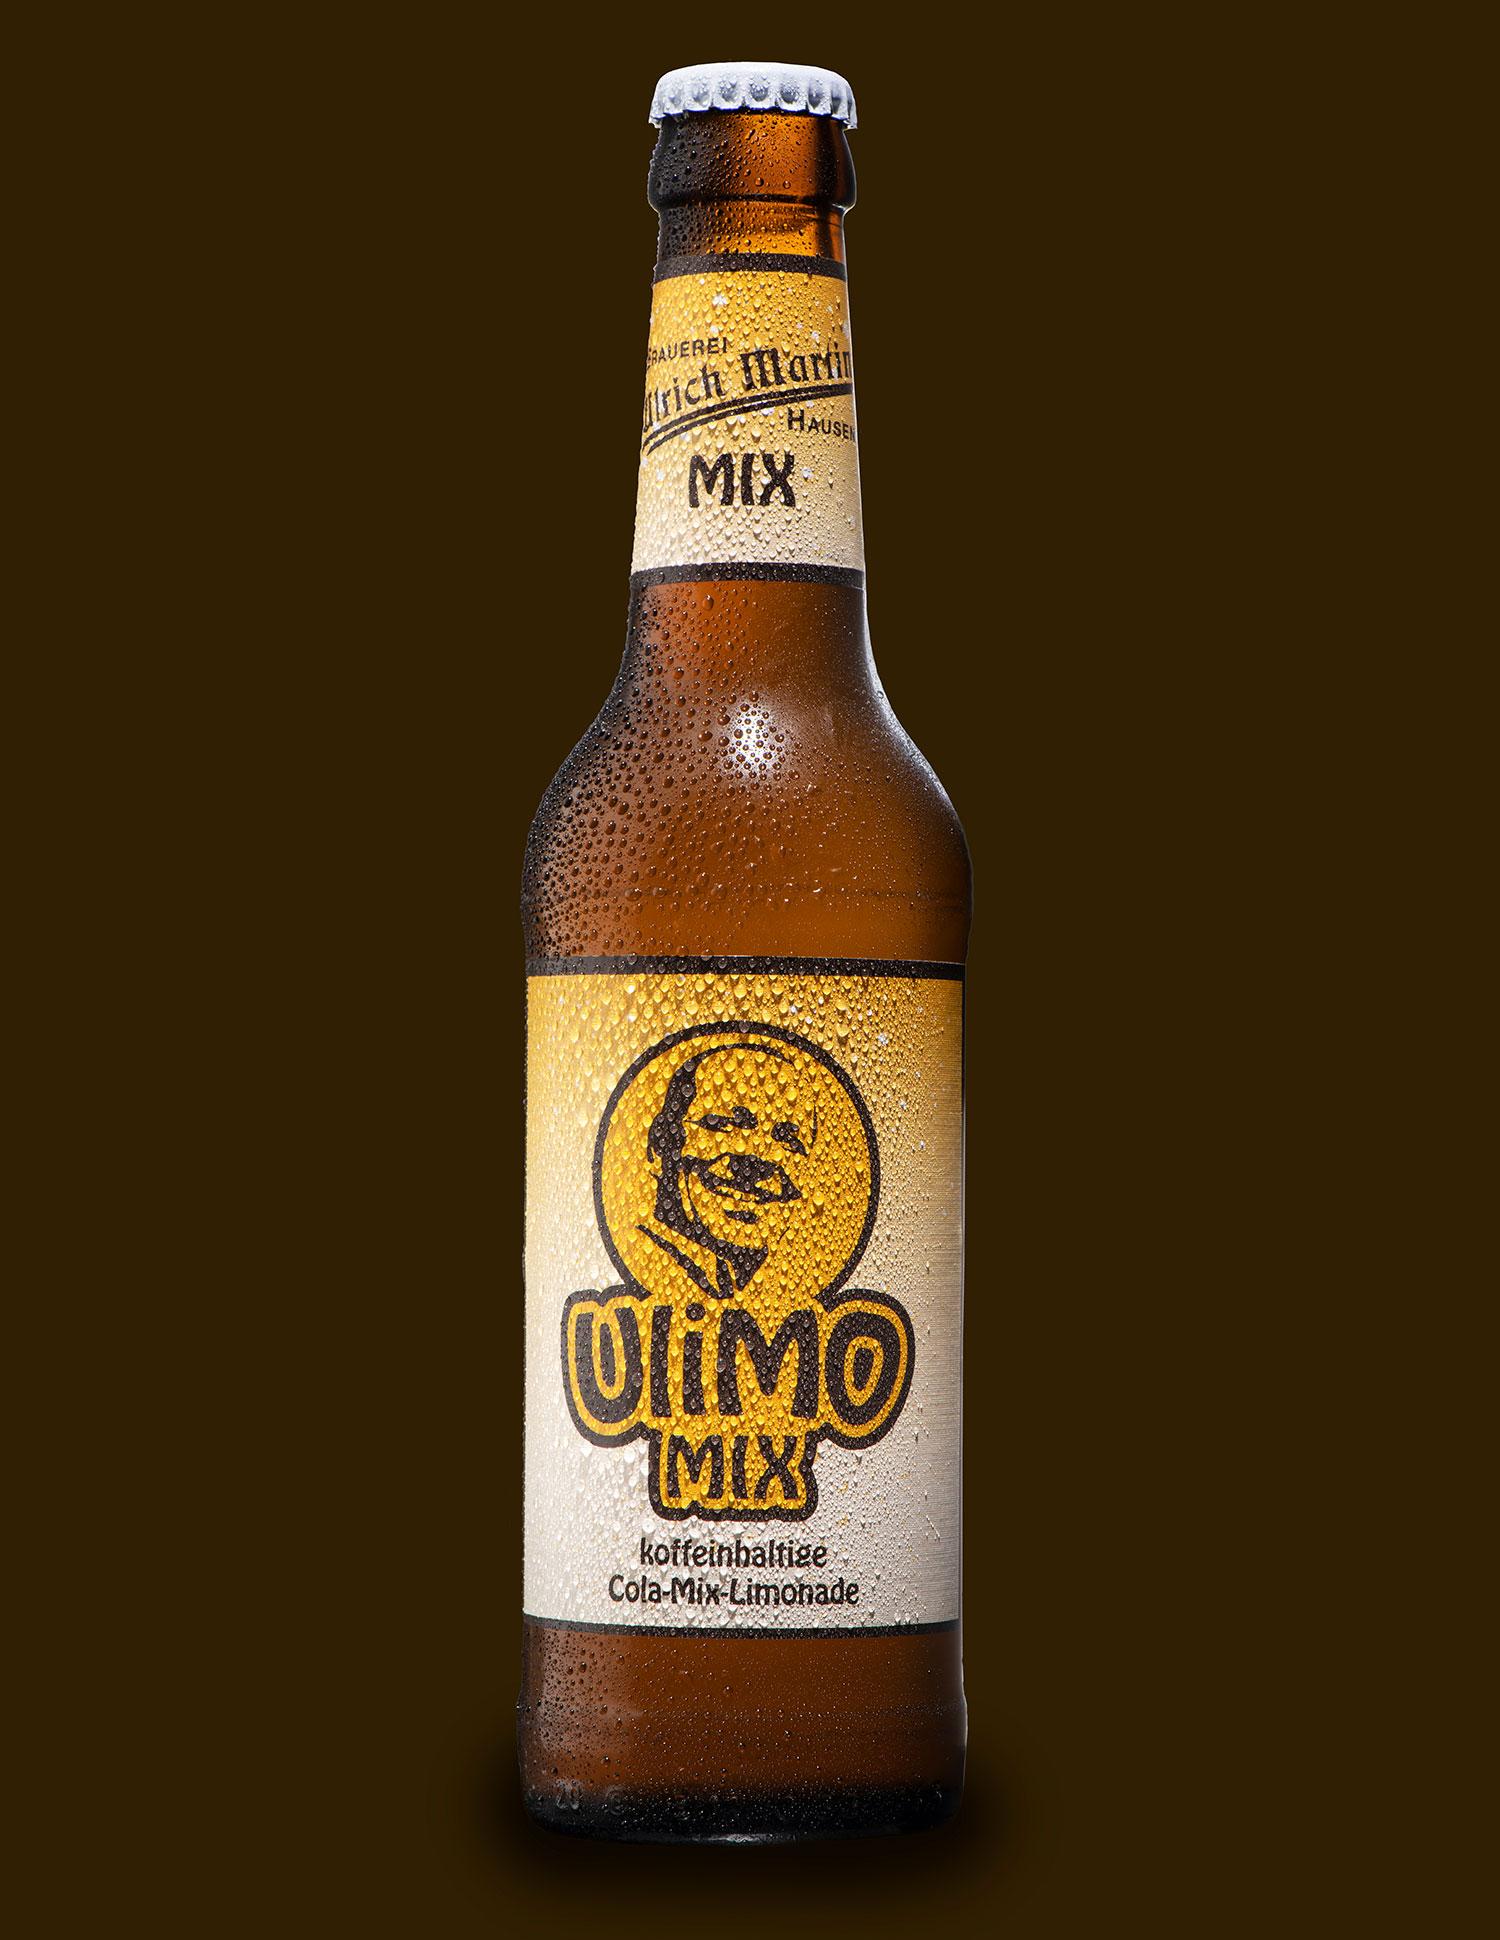 Ulimo Mix - koffeinhaltige Cola-Mix-Limonade